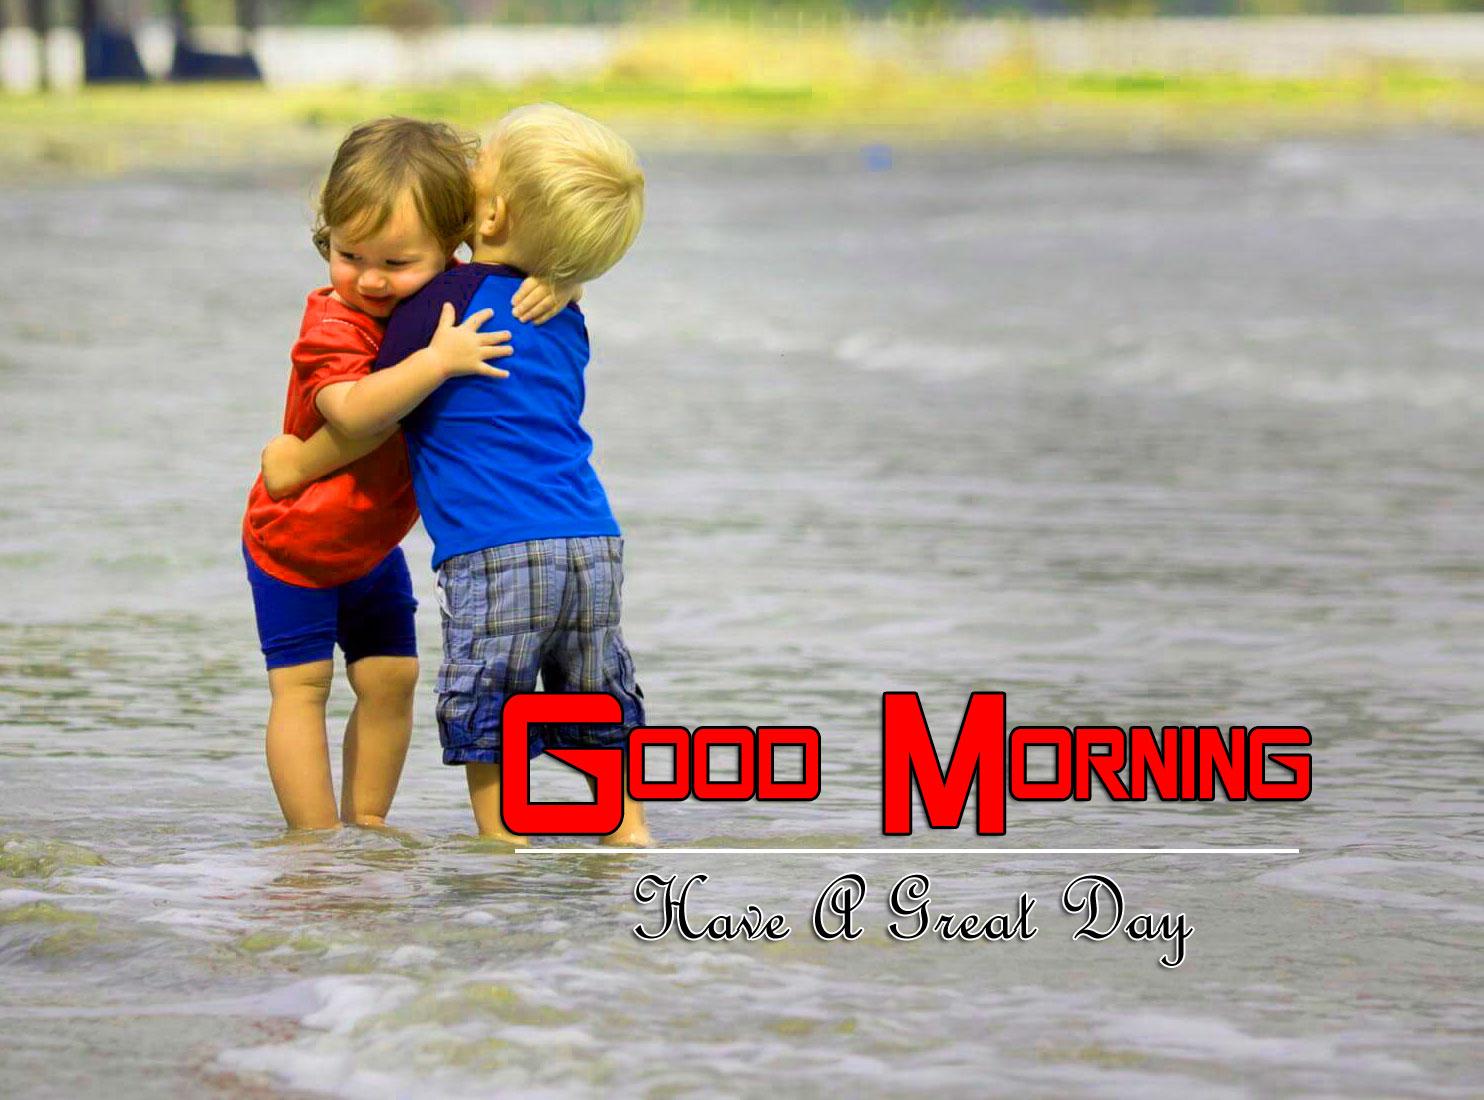 Romantic Good Morning Pics Images